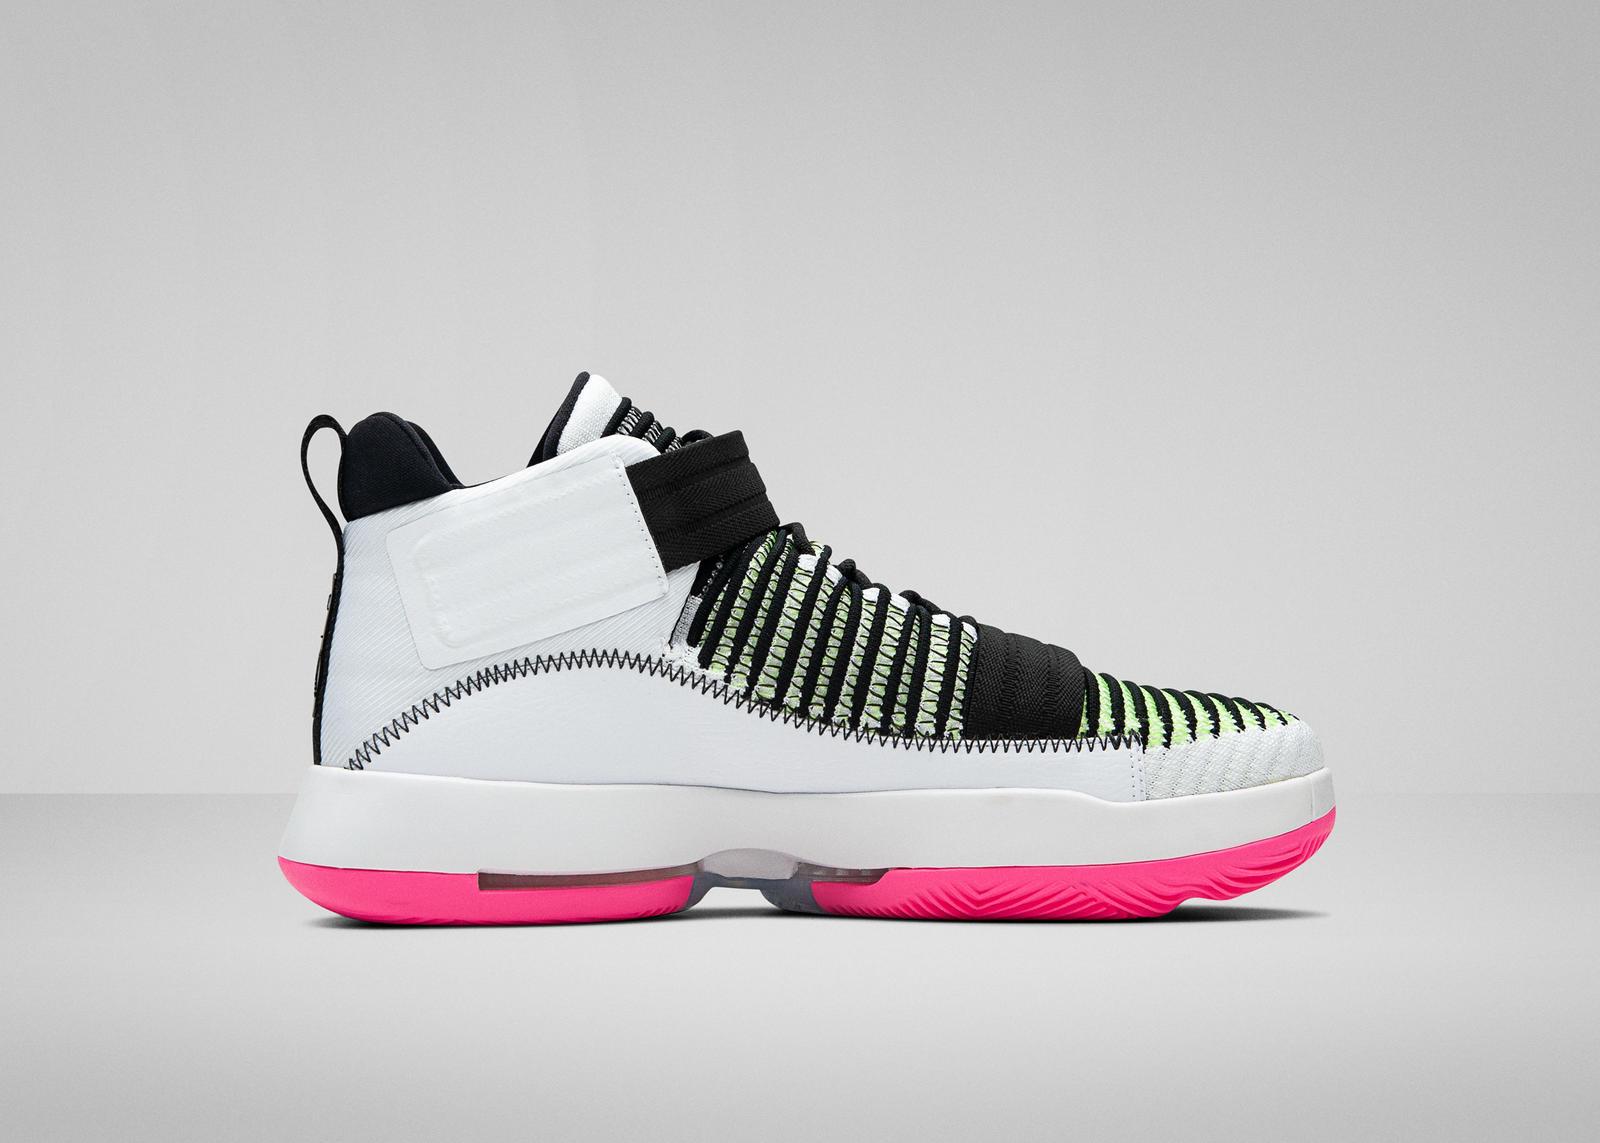 the best attitude 73acf d260c Jimmy Butler Jordan Supreme Elevation - Nike News